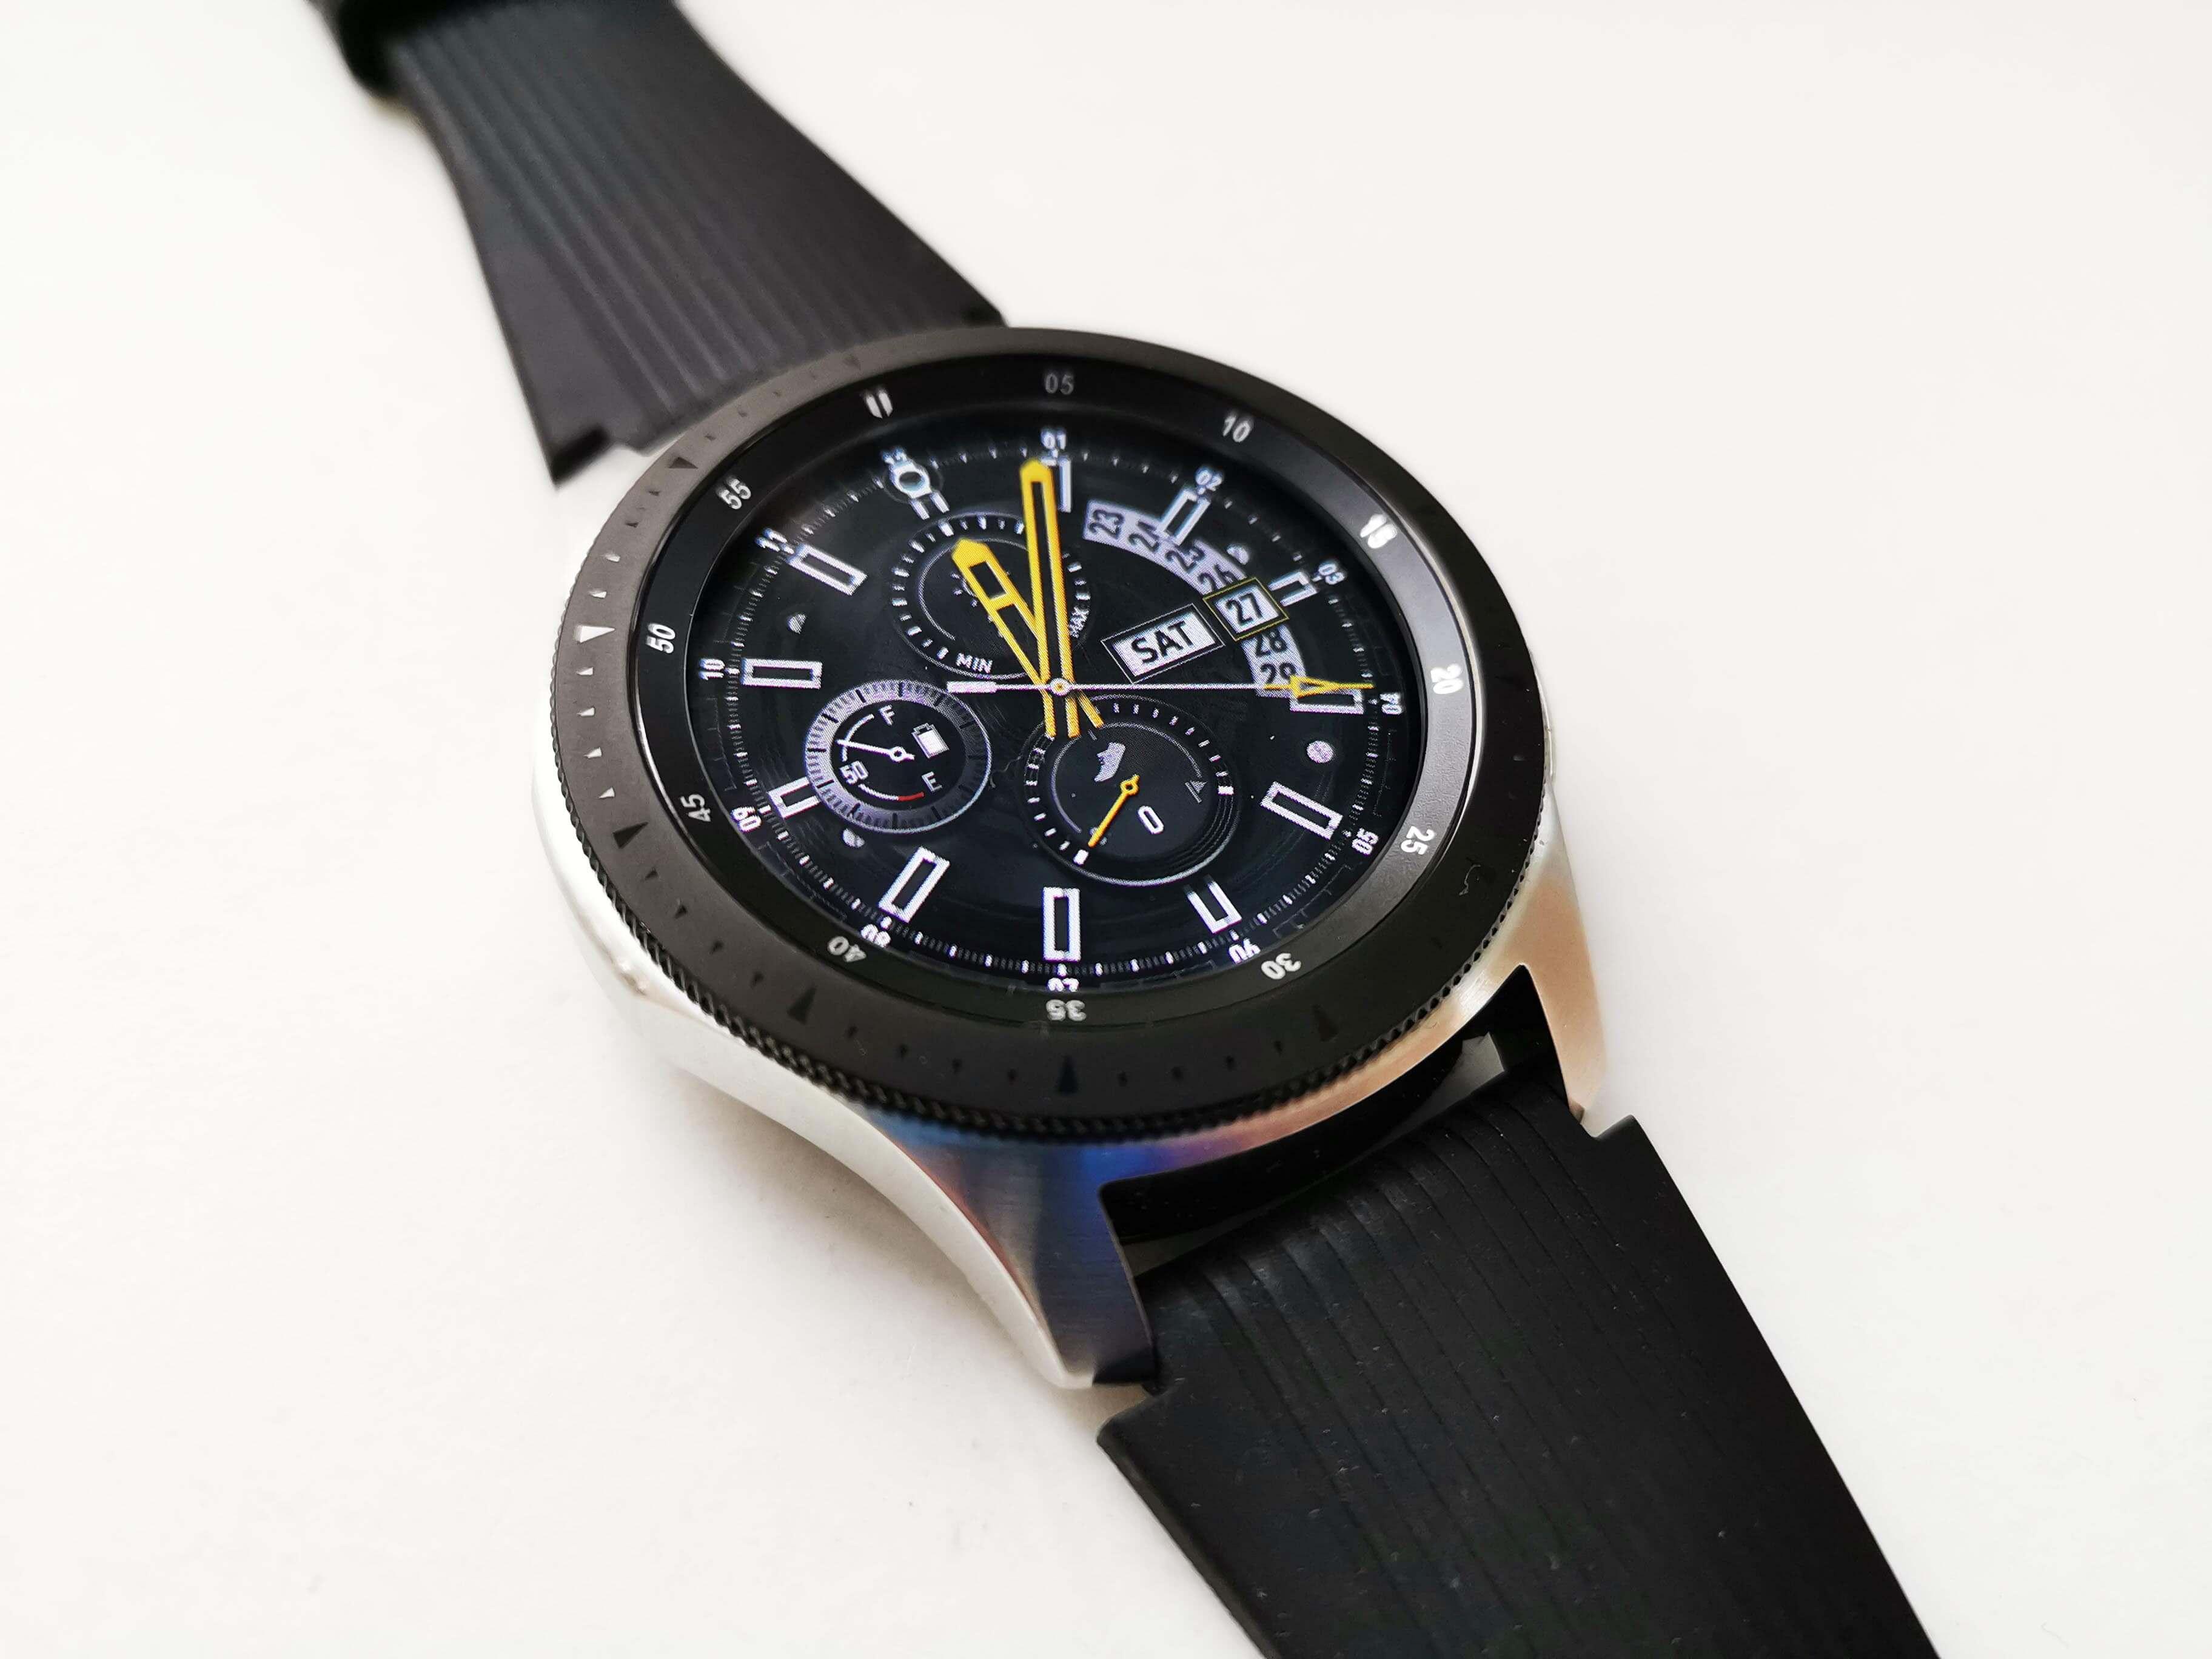 Samsung Galaxy Watch Review Romana si Pareri - Foto 1